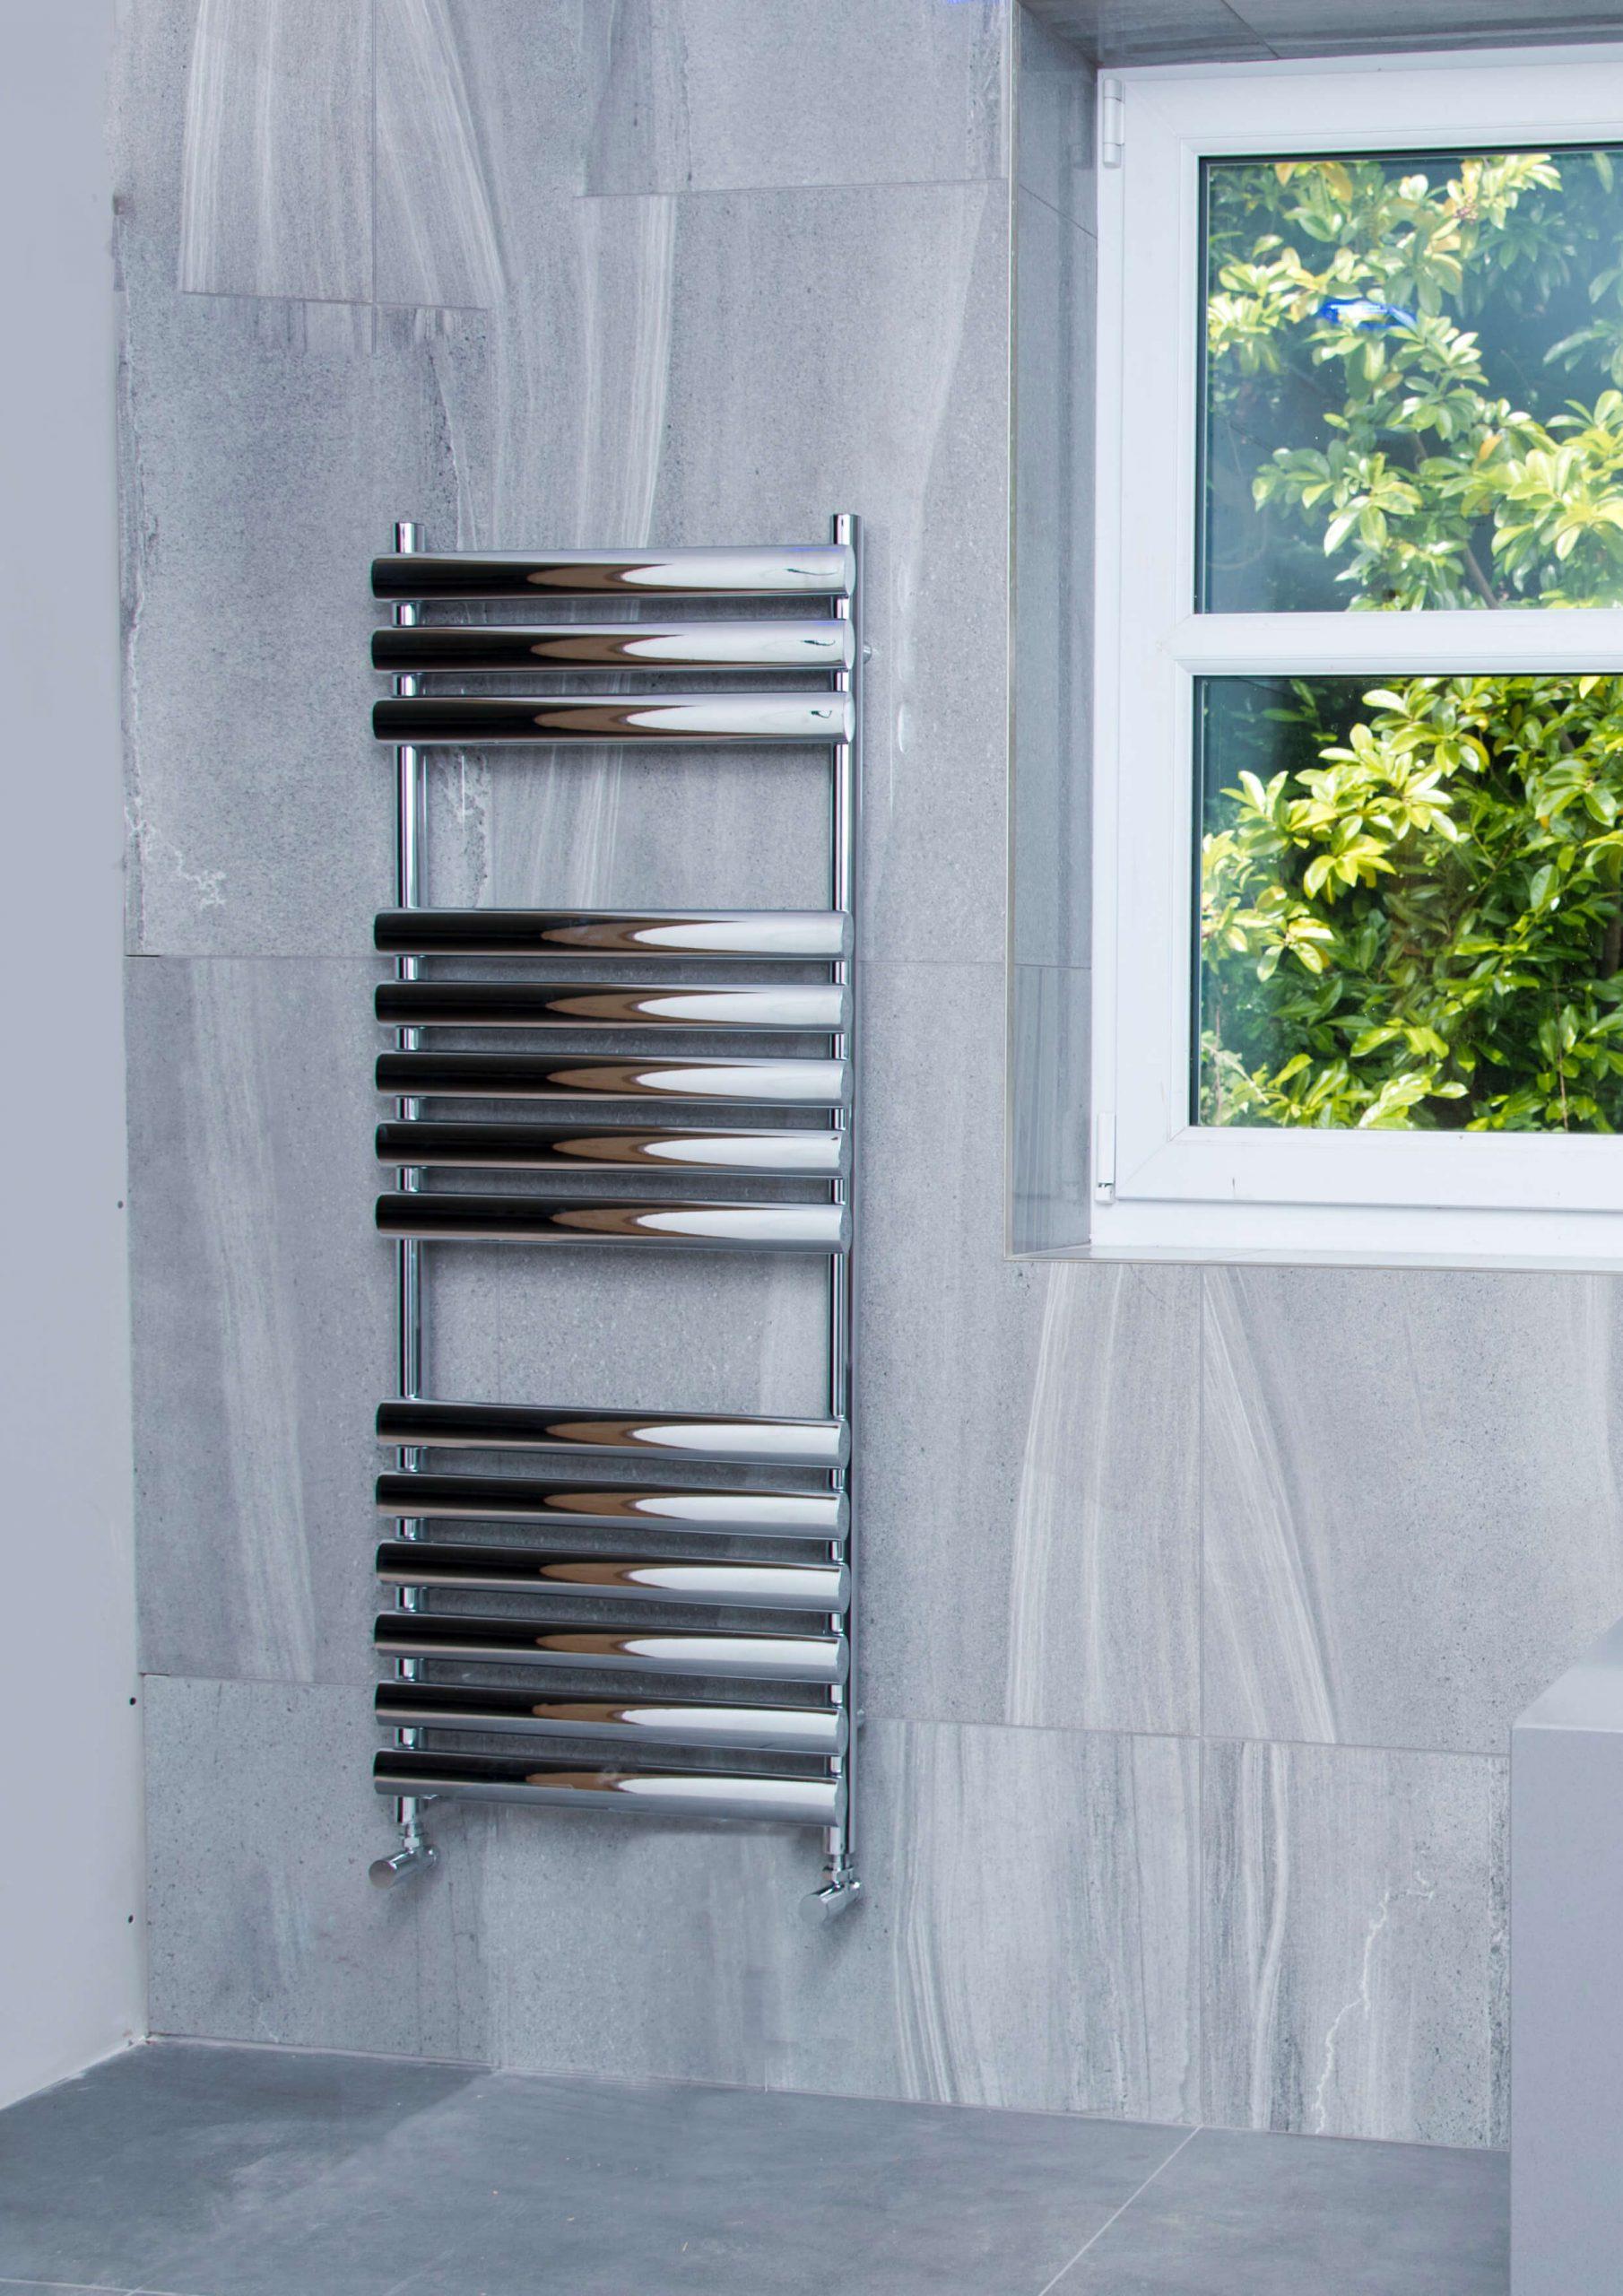 Towelrads Dorney Towel Rail Chrome - The Designer Radiator ...